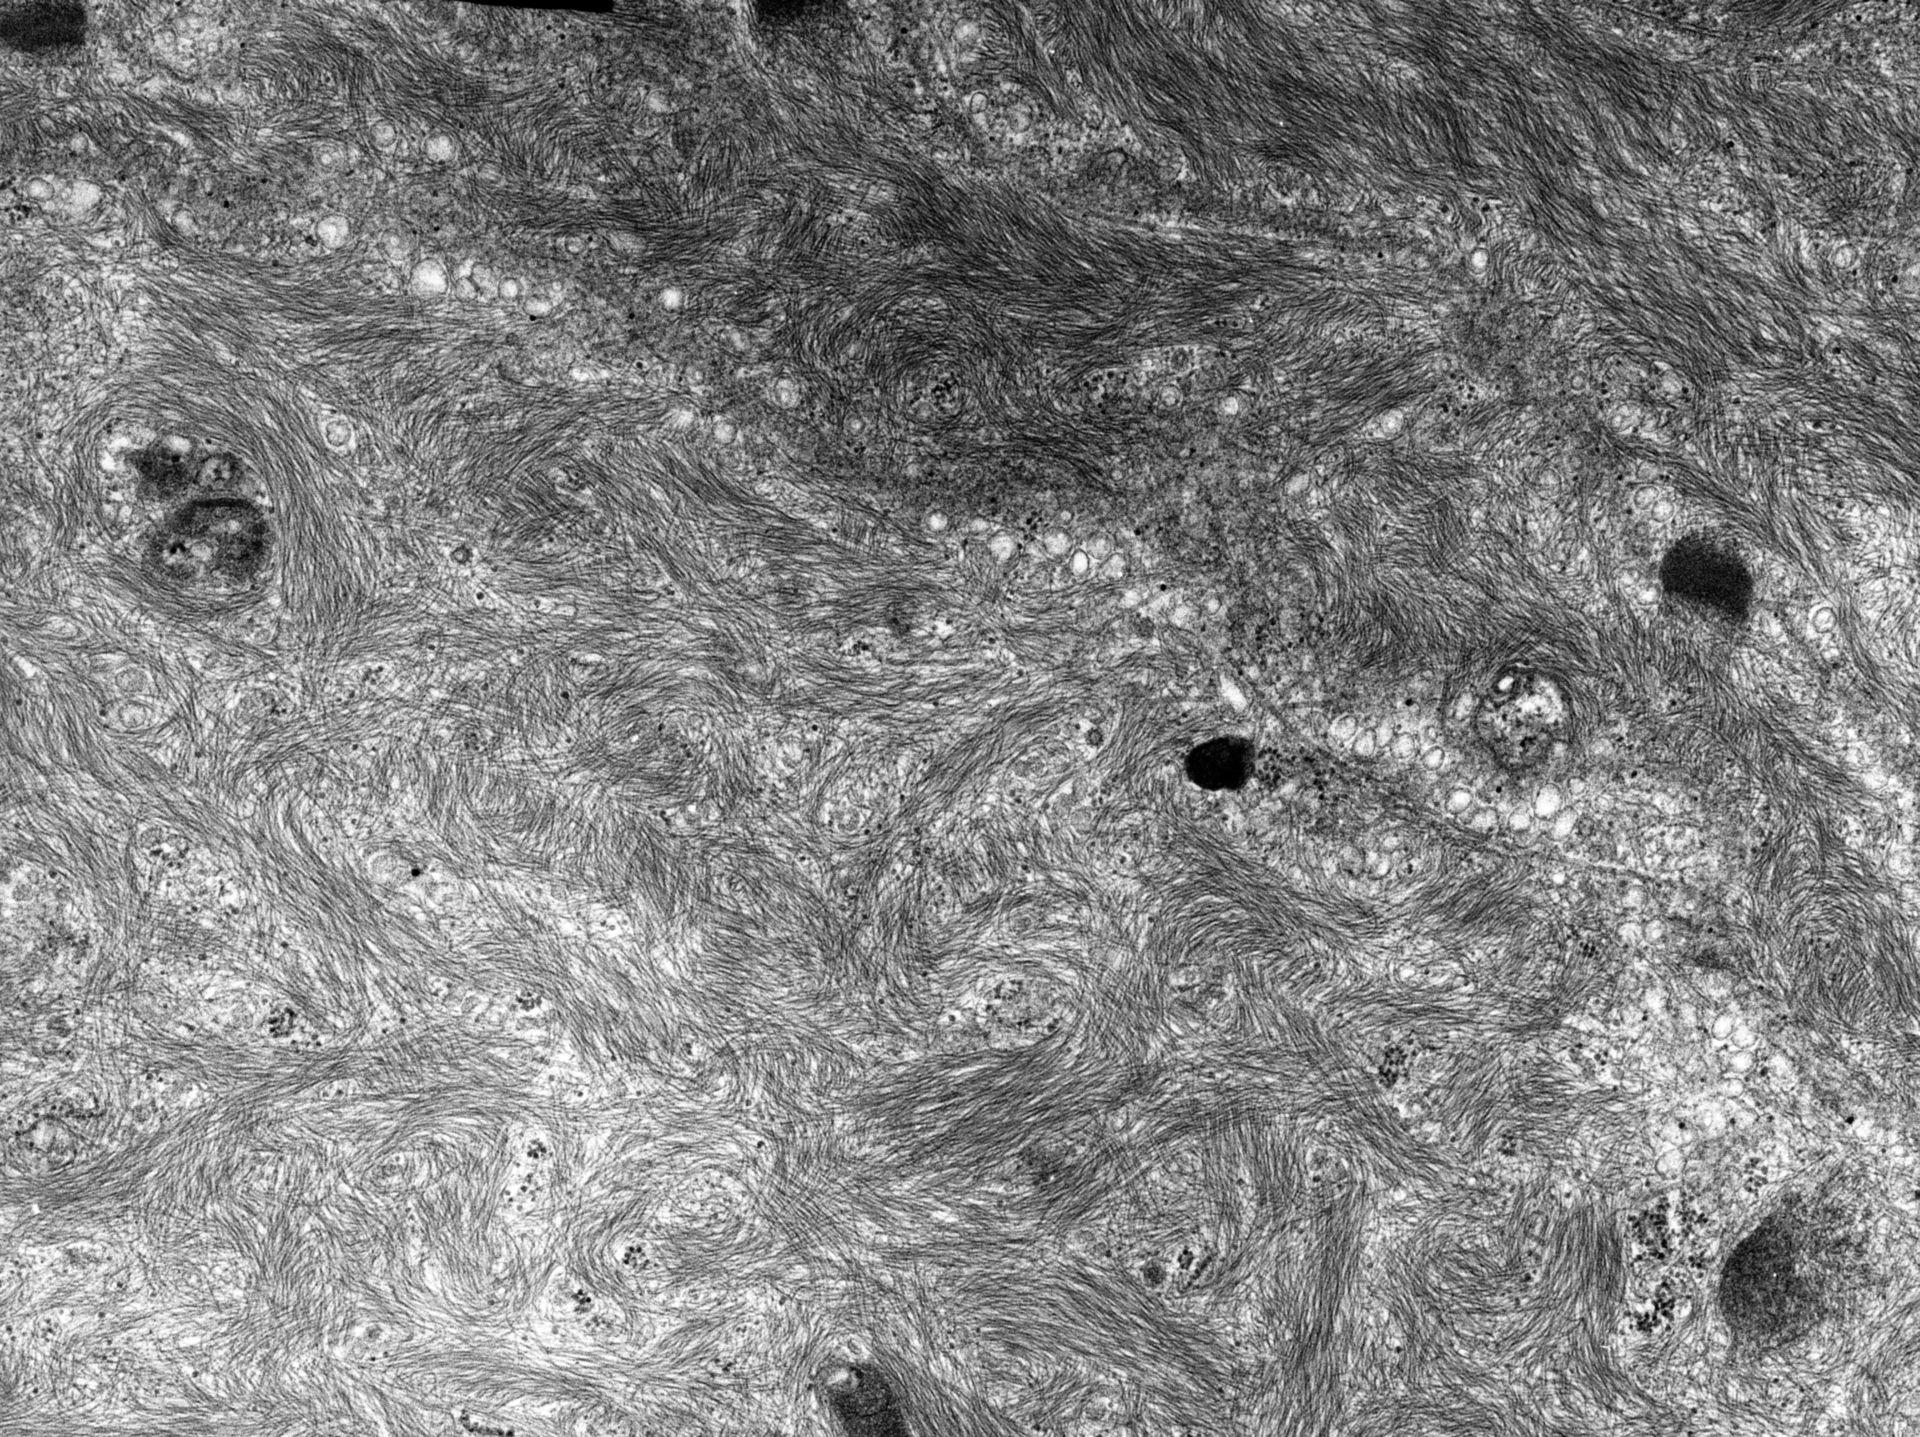 Rana catesbeiana (Plasma membrane) - CIL:10440